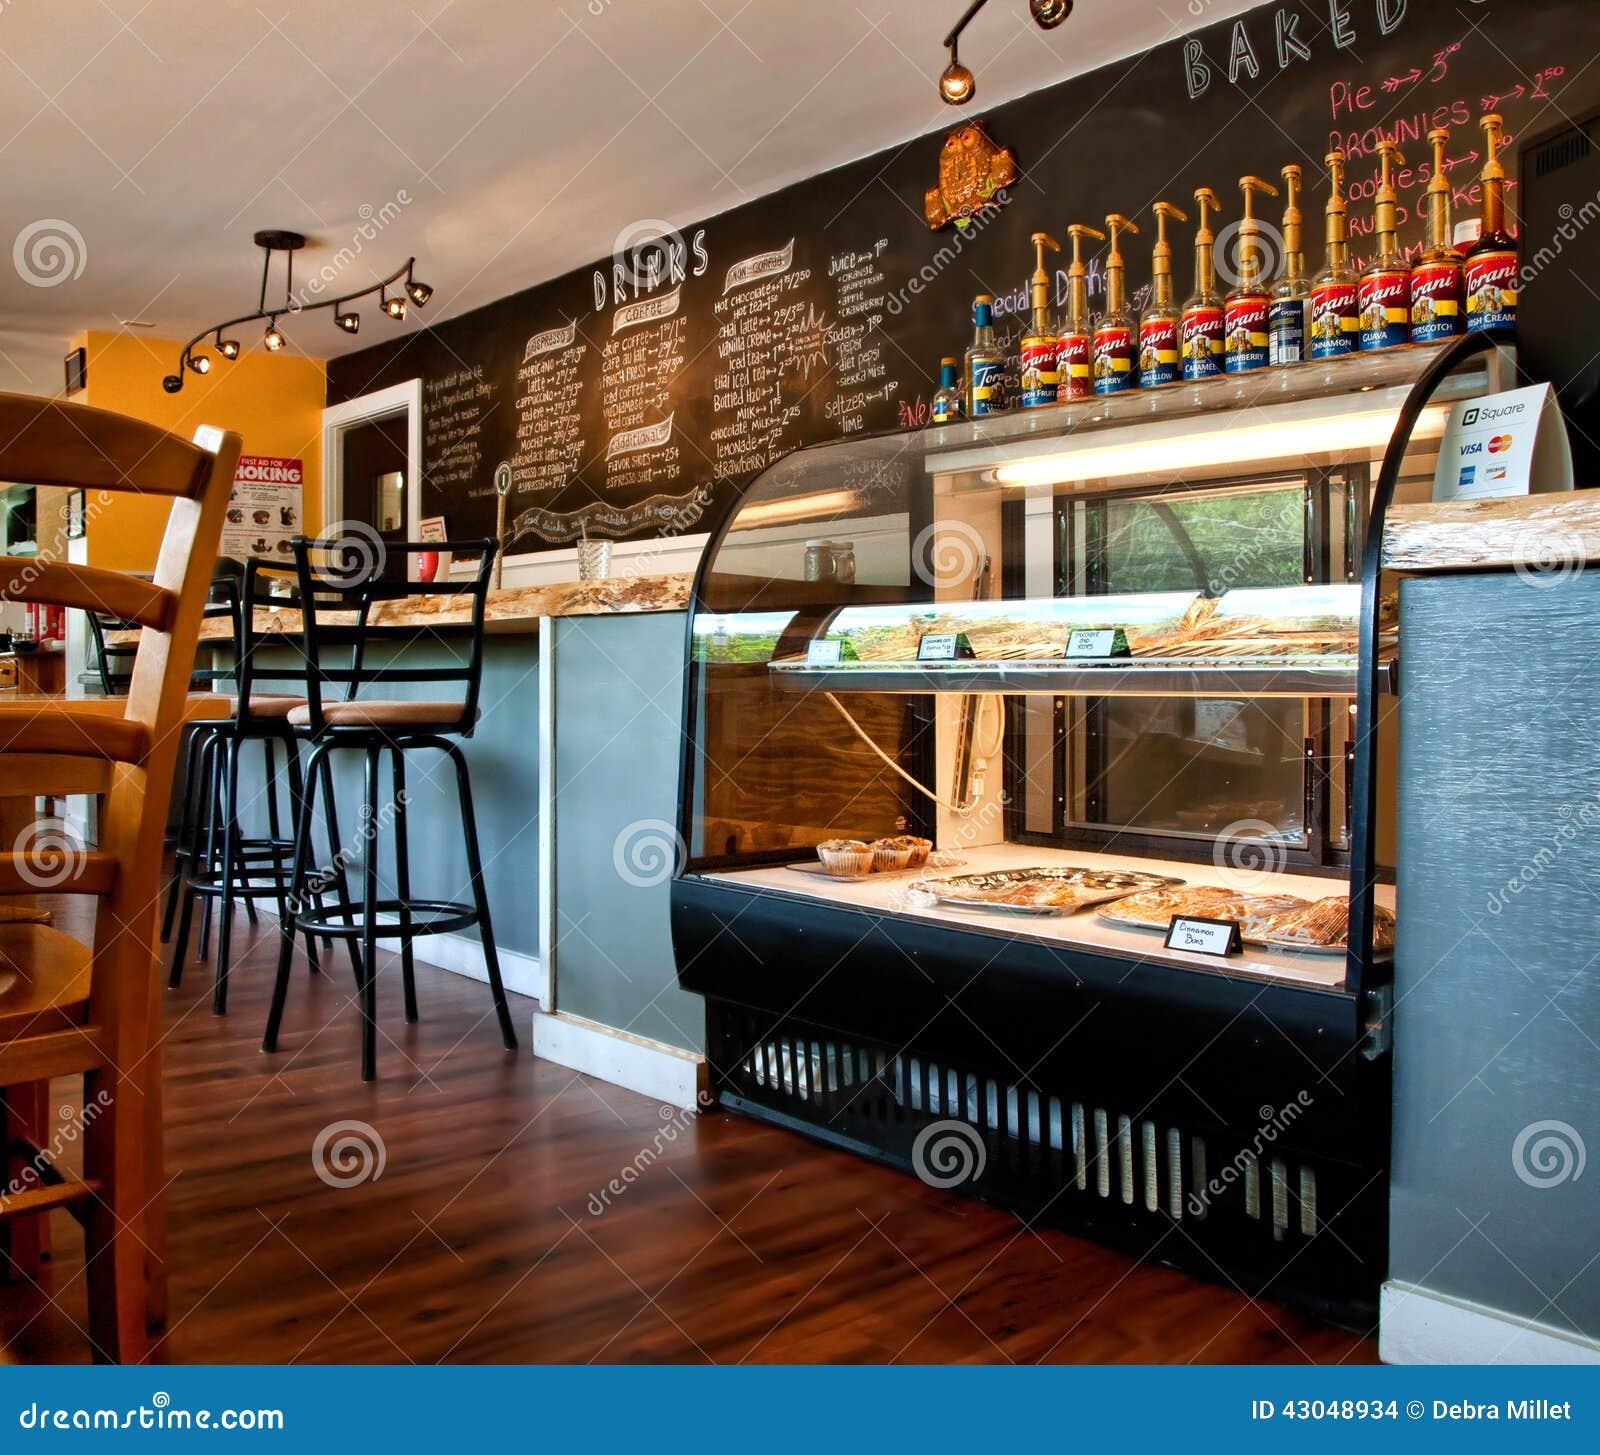 Dreams Cafe And Bar